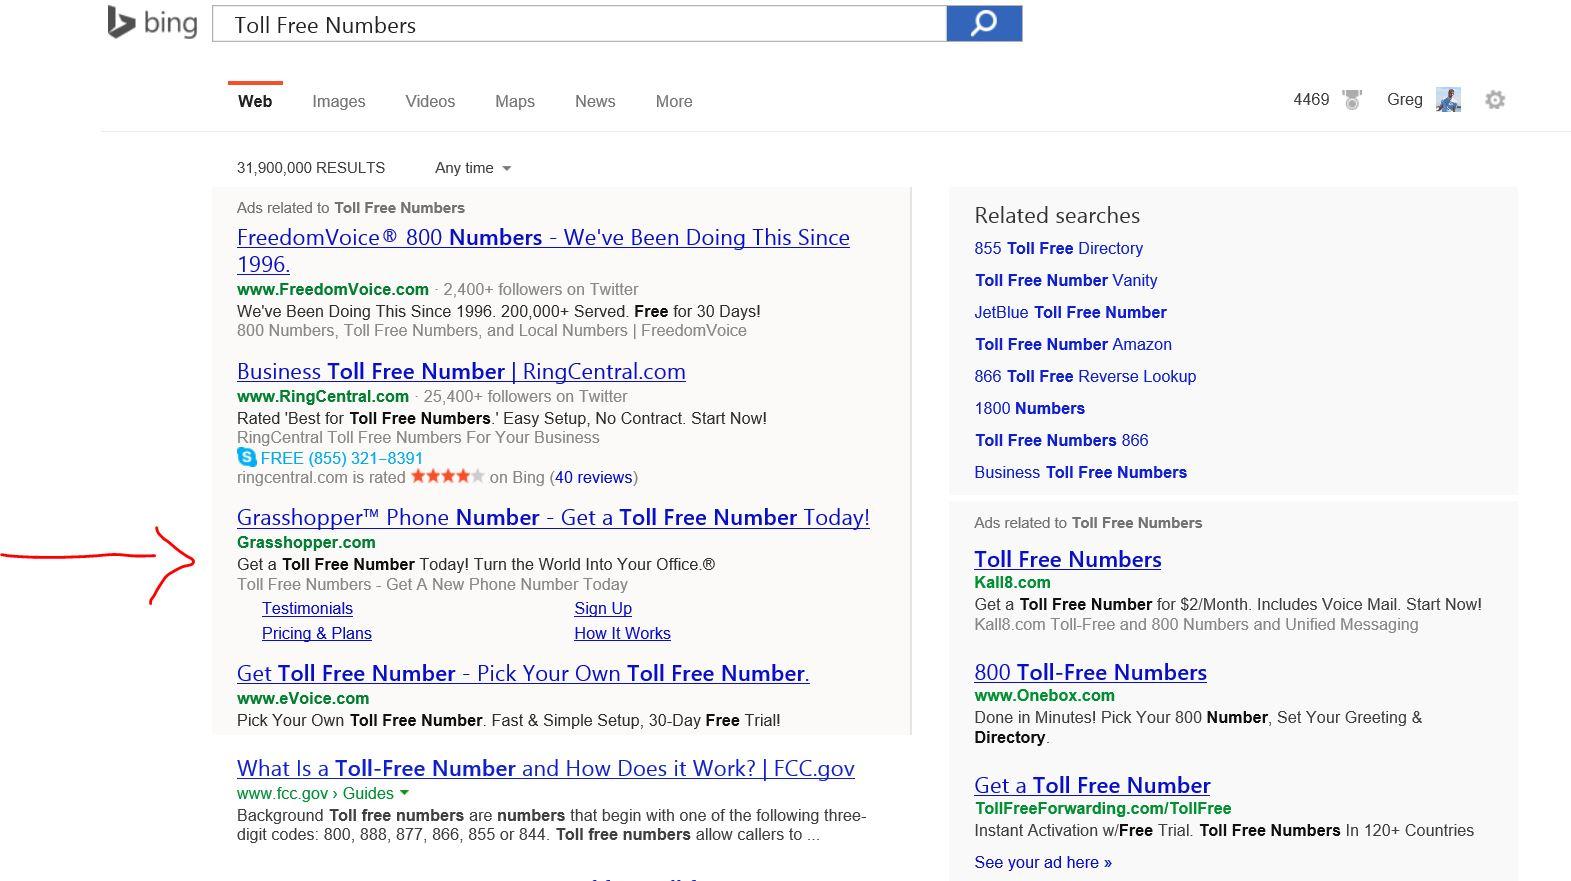 Example of sitelinks in Bing Ads